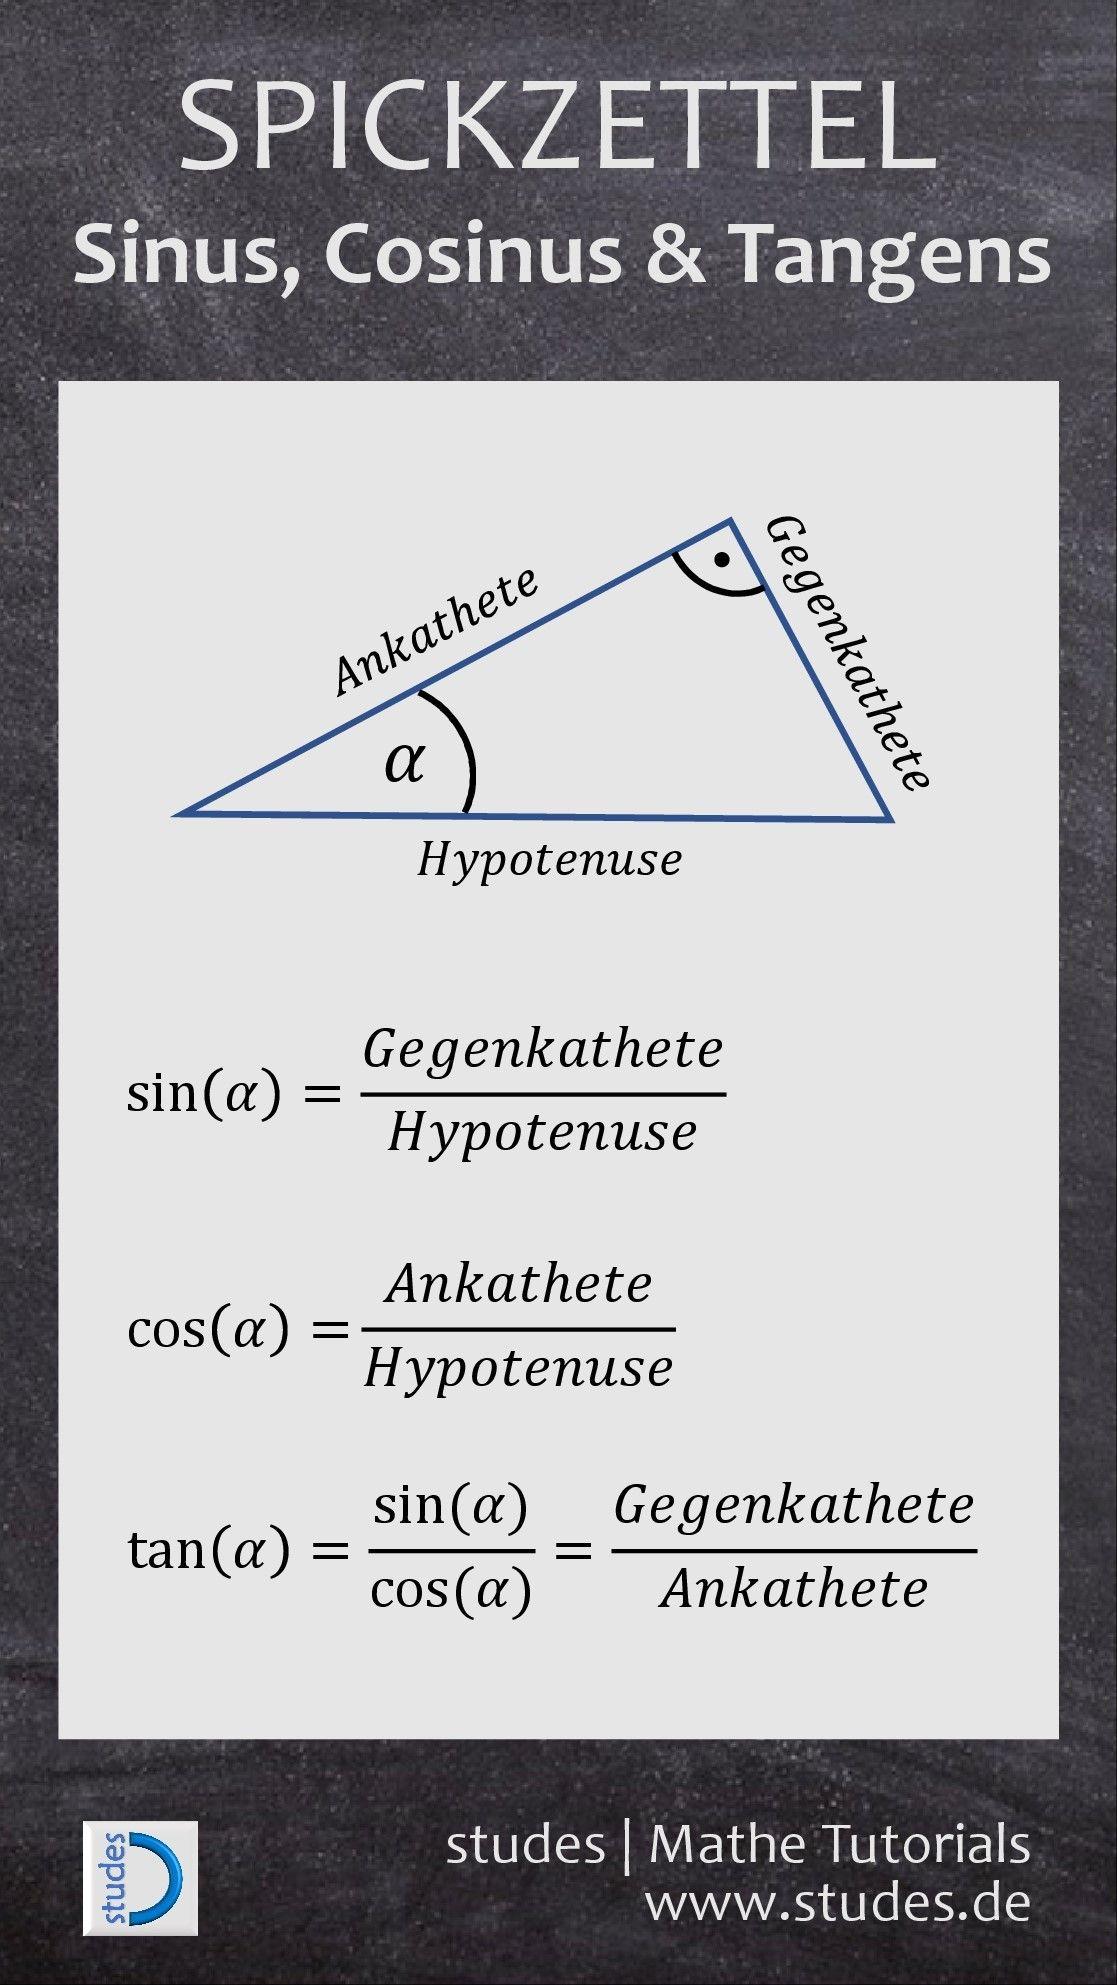 Sinus-Cosinus-Tangens | Geometrie | Pinterest | Mathe, Schule und ...